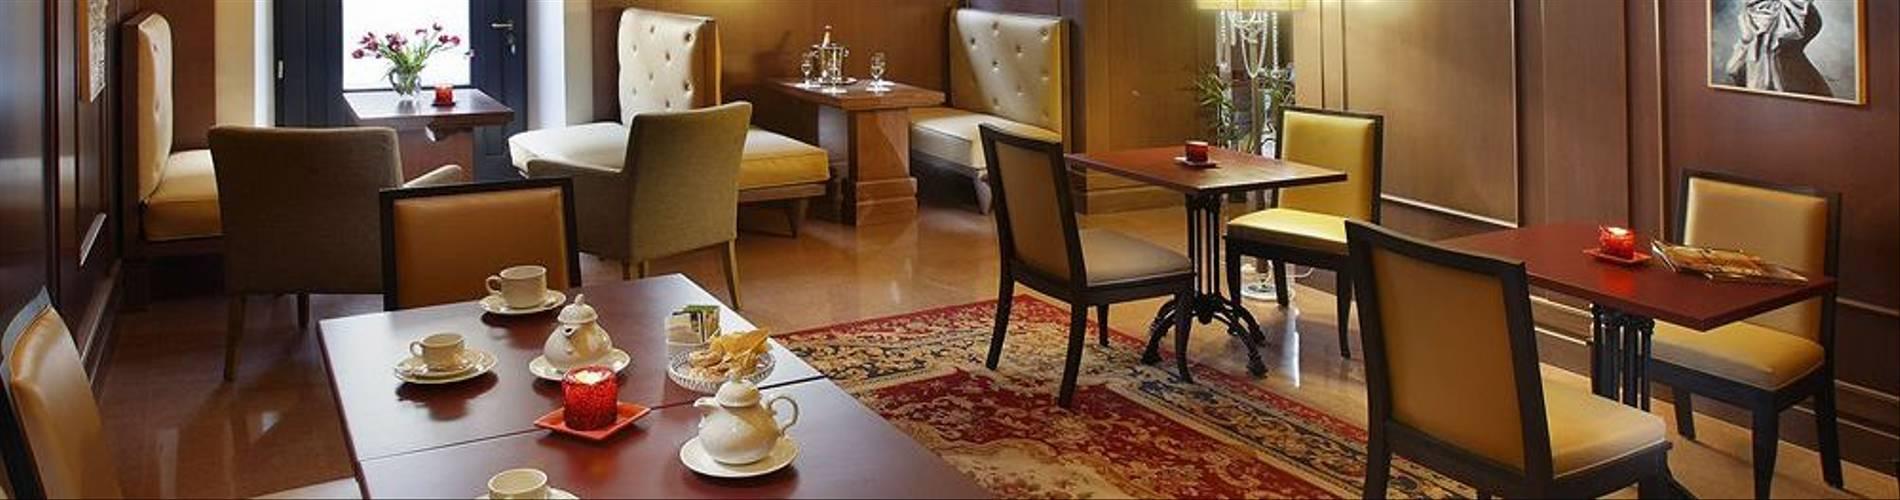 06-Hotel San Luca Palace.jpg